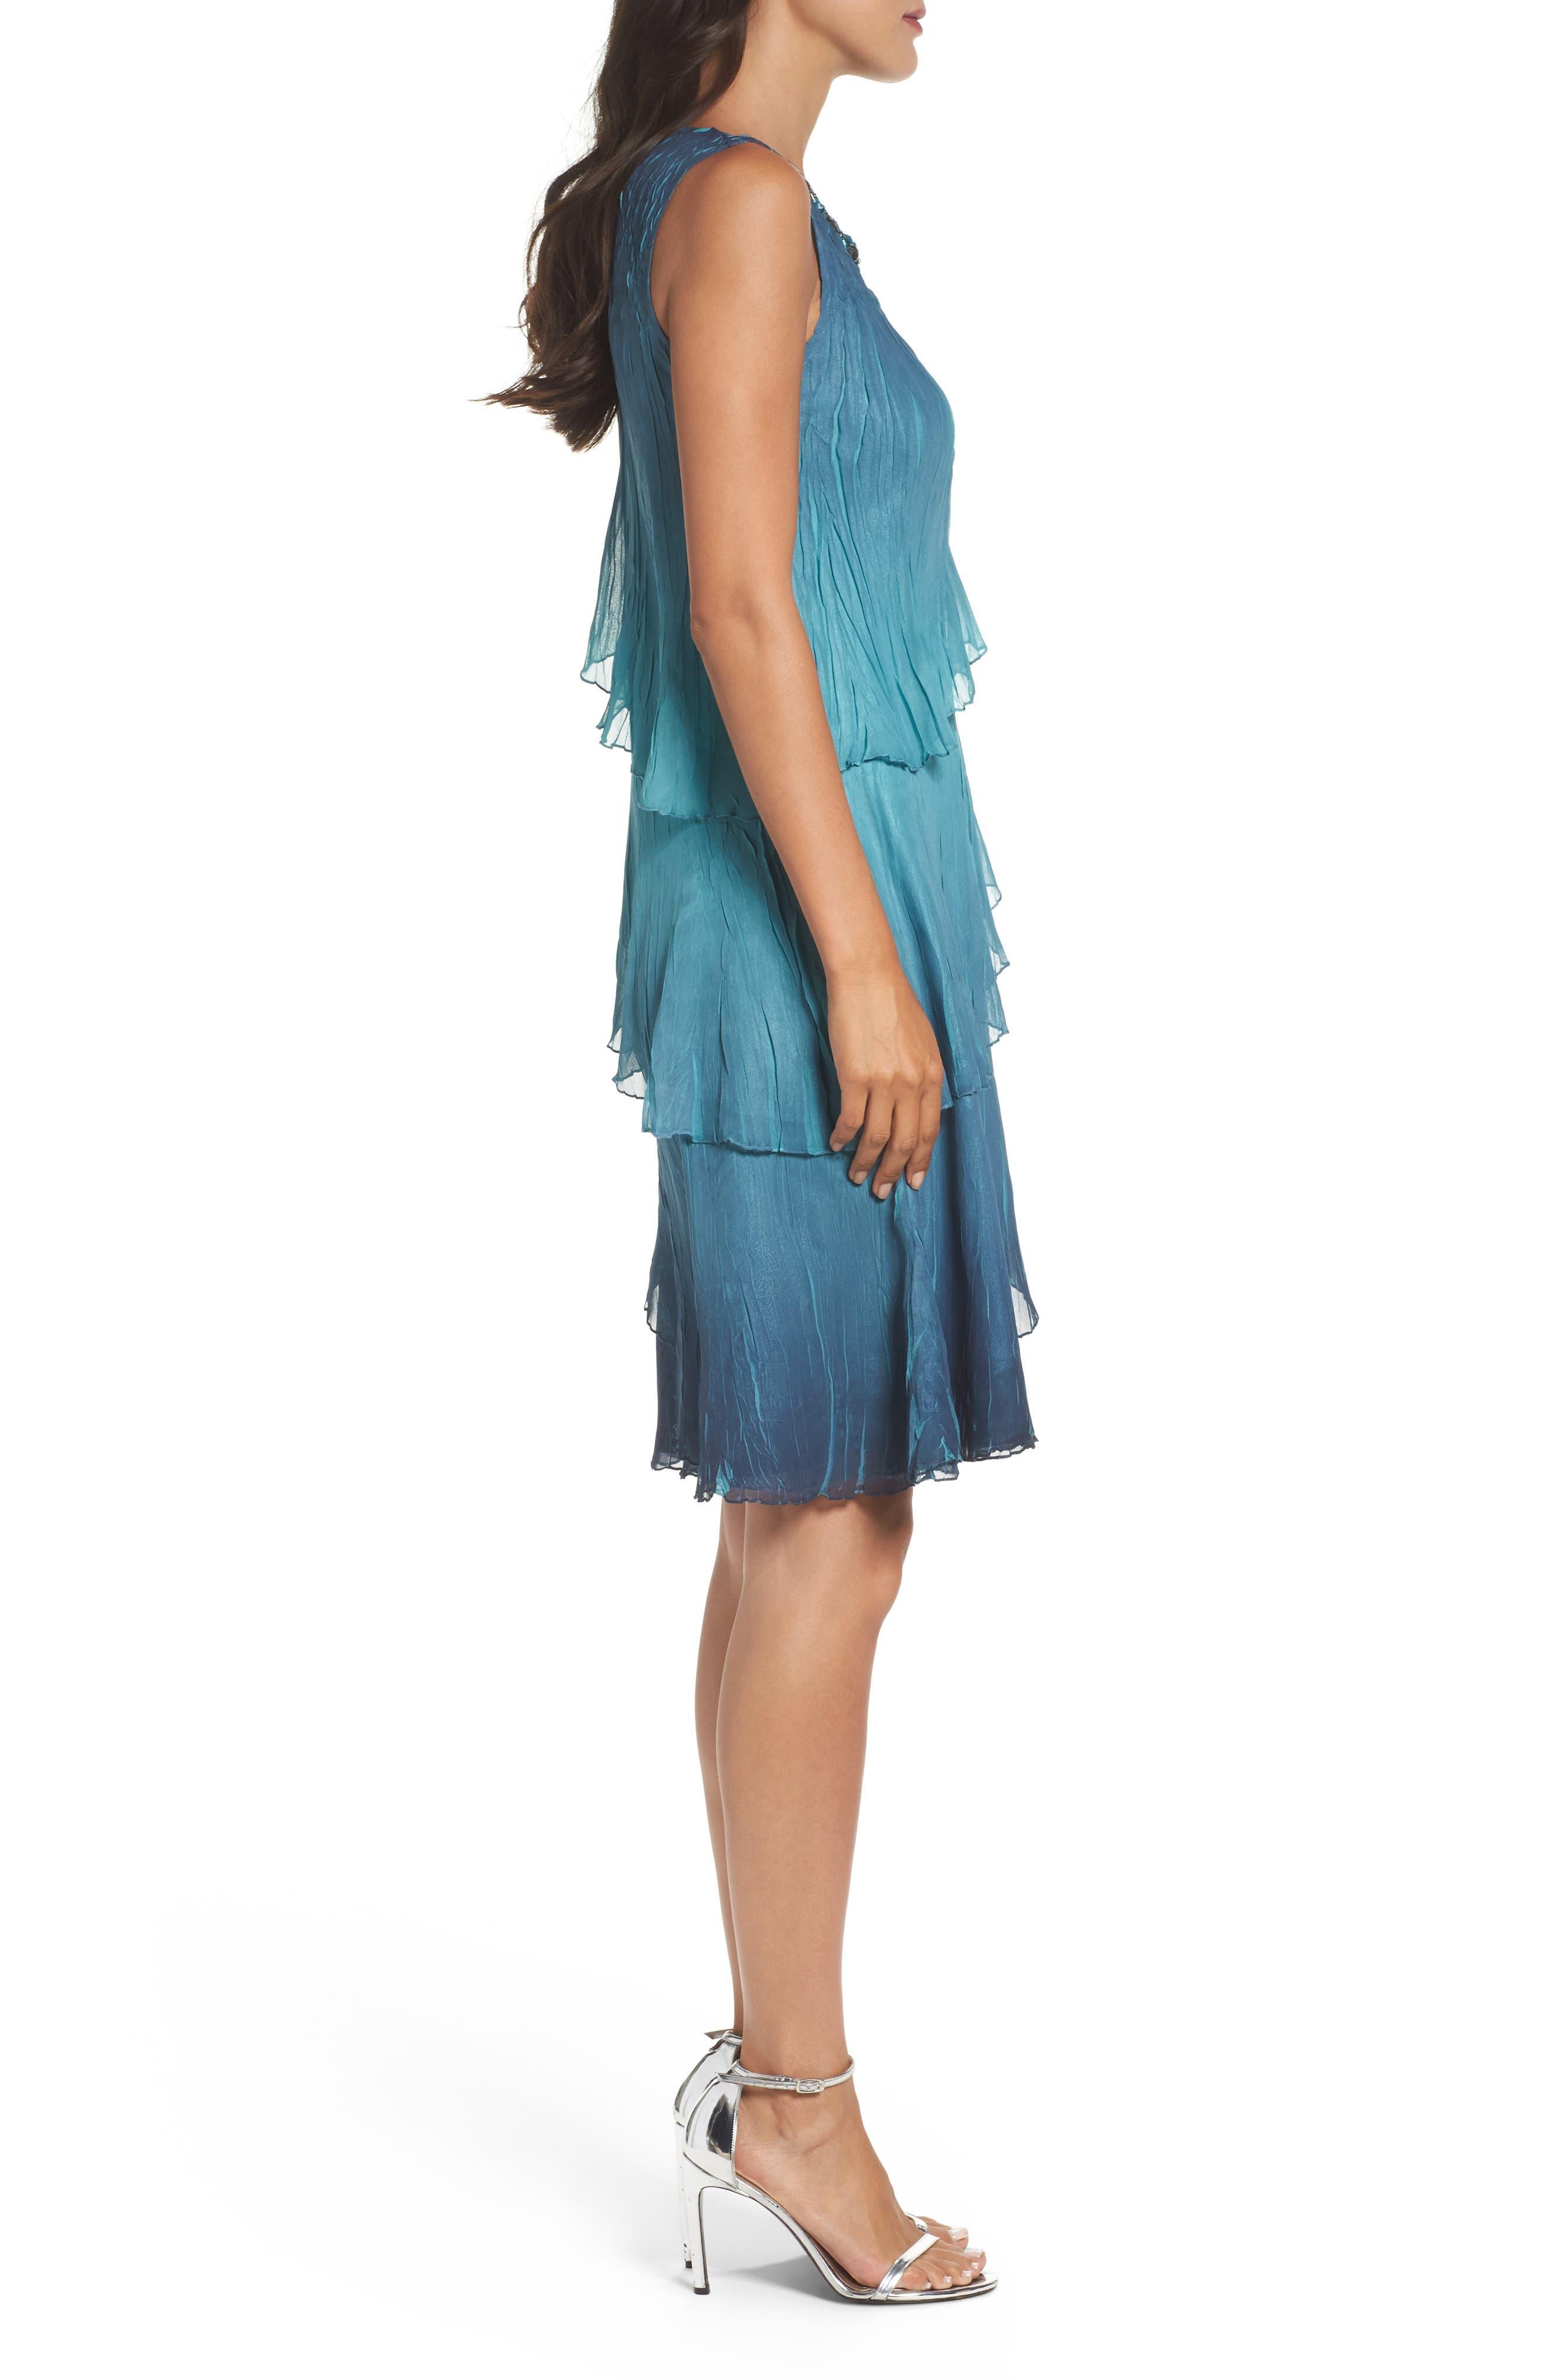 Tiered Chiffon Shift Dress with Shawl,                             Alternate thumbnail 3, color,                             491